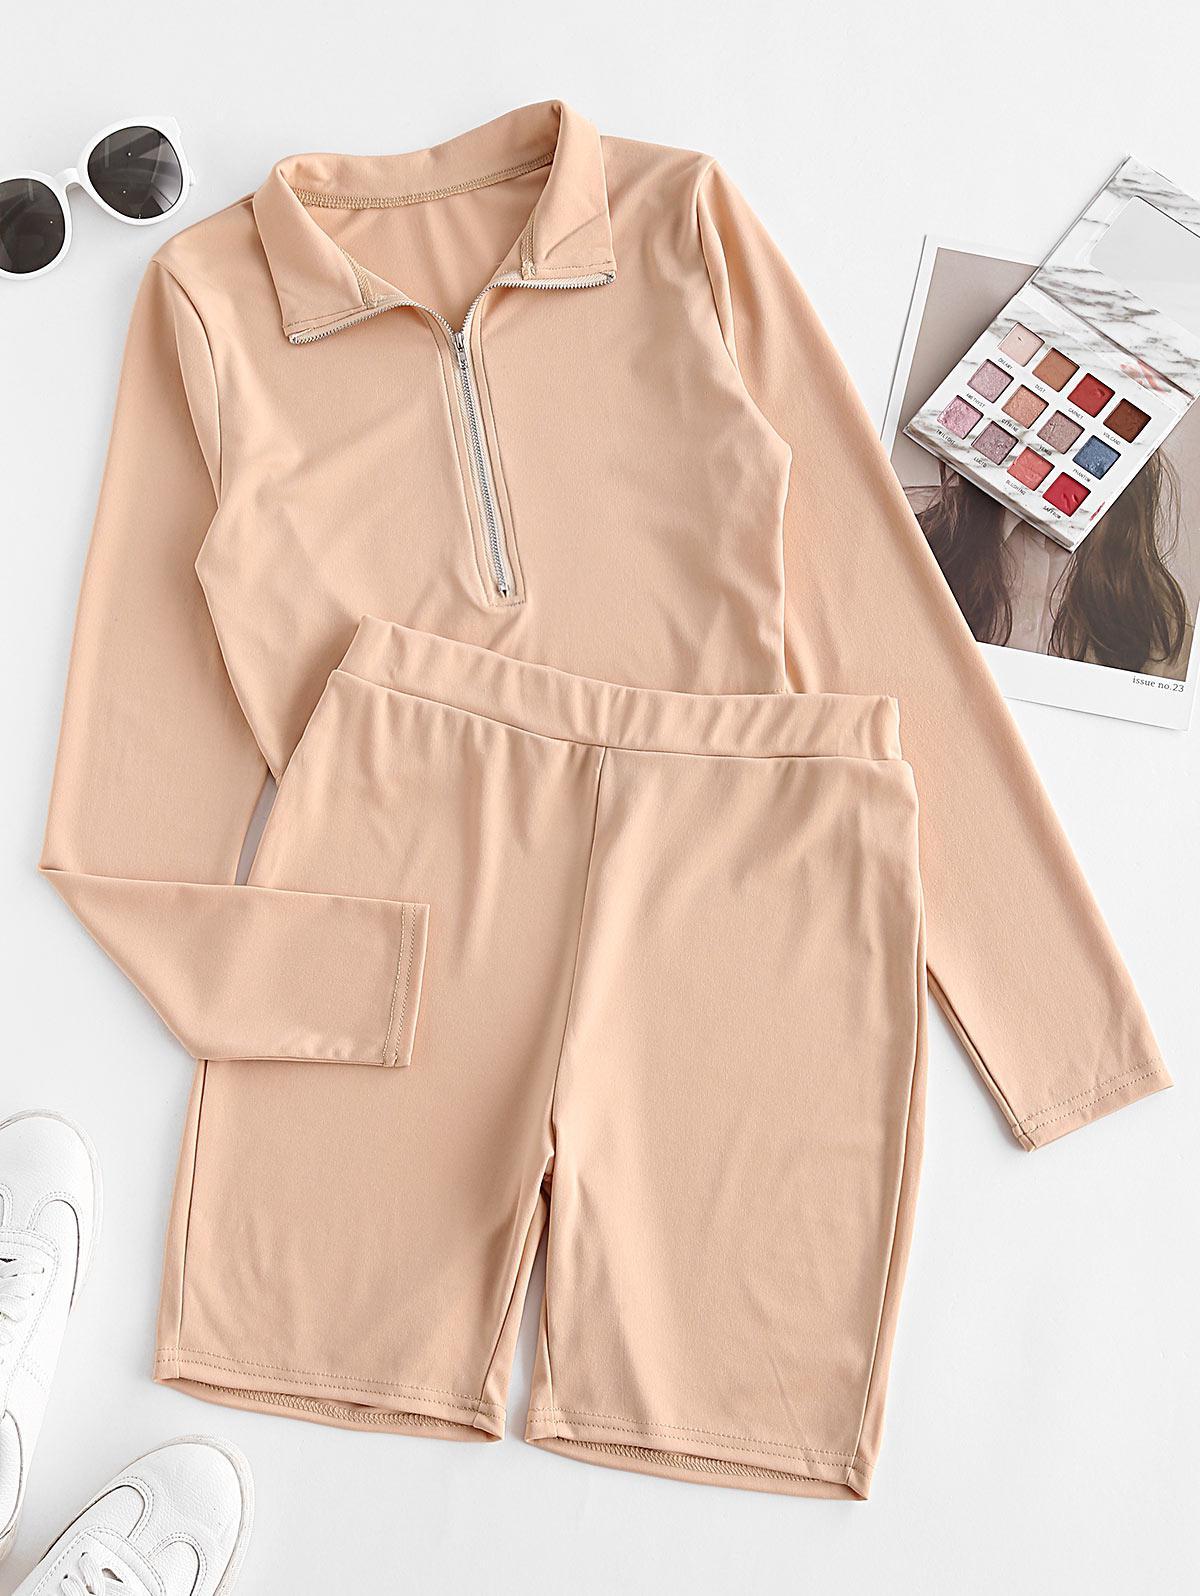 Two Piece Half Zip Cropped Biker Shorts Set